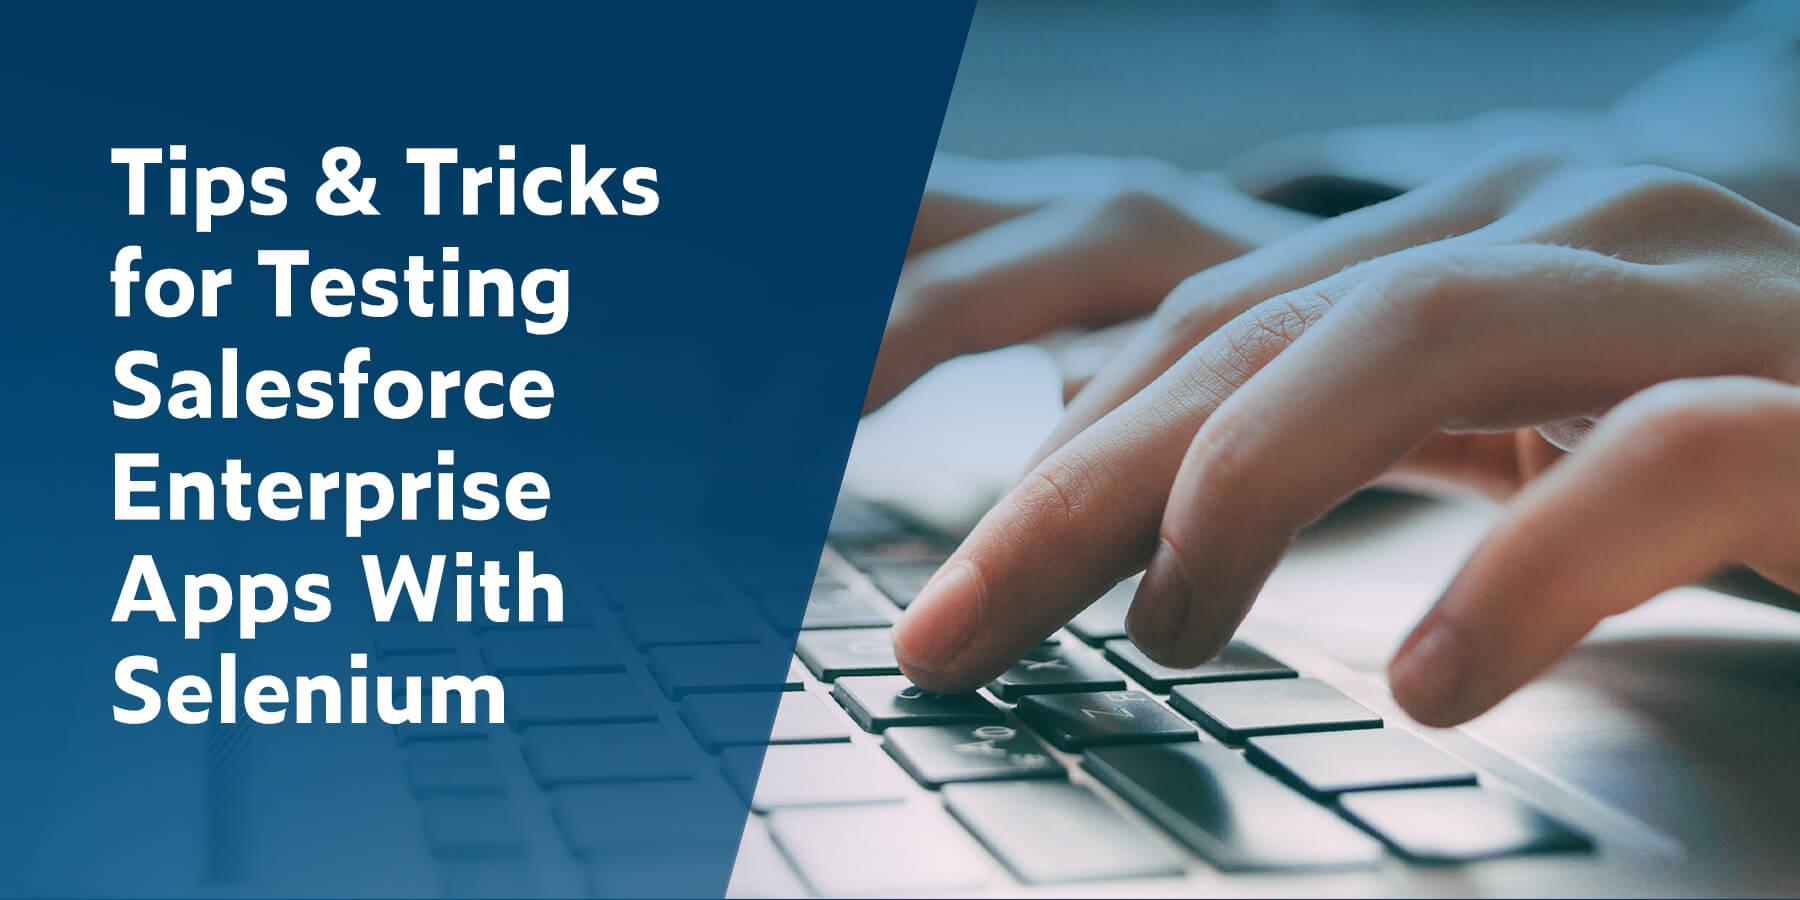 Tips & Tricks for Testing Salesforce Enterprise Apps With Selenium